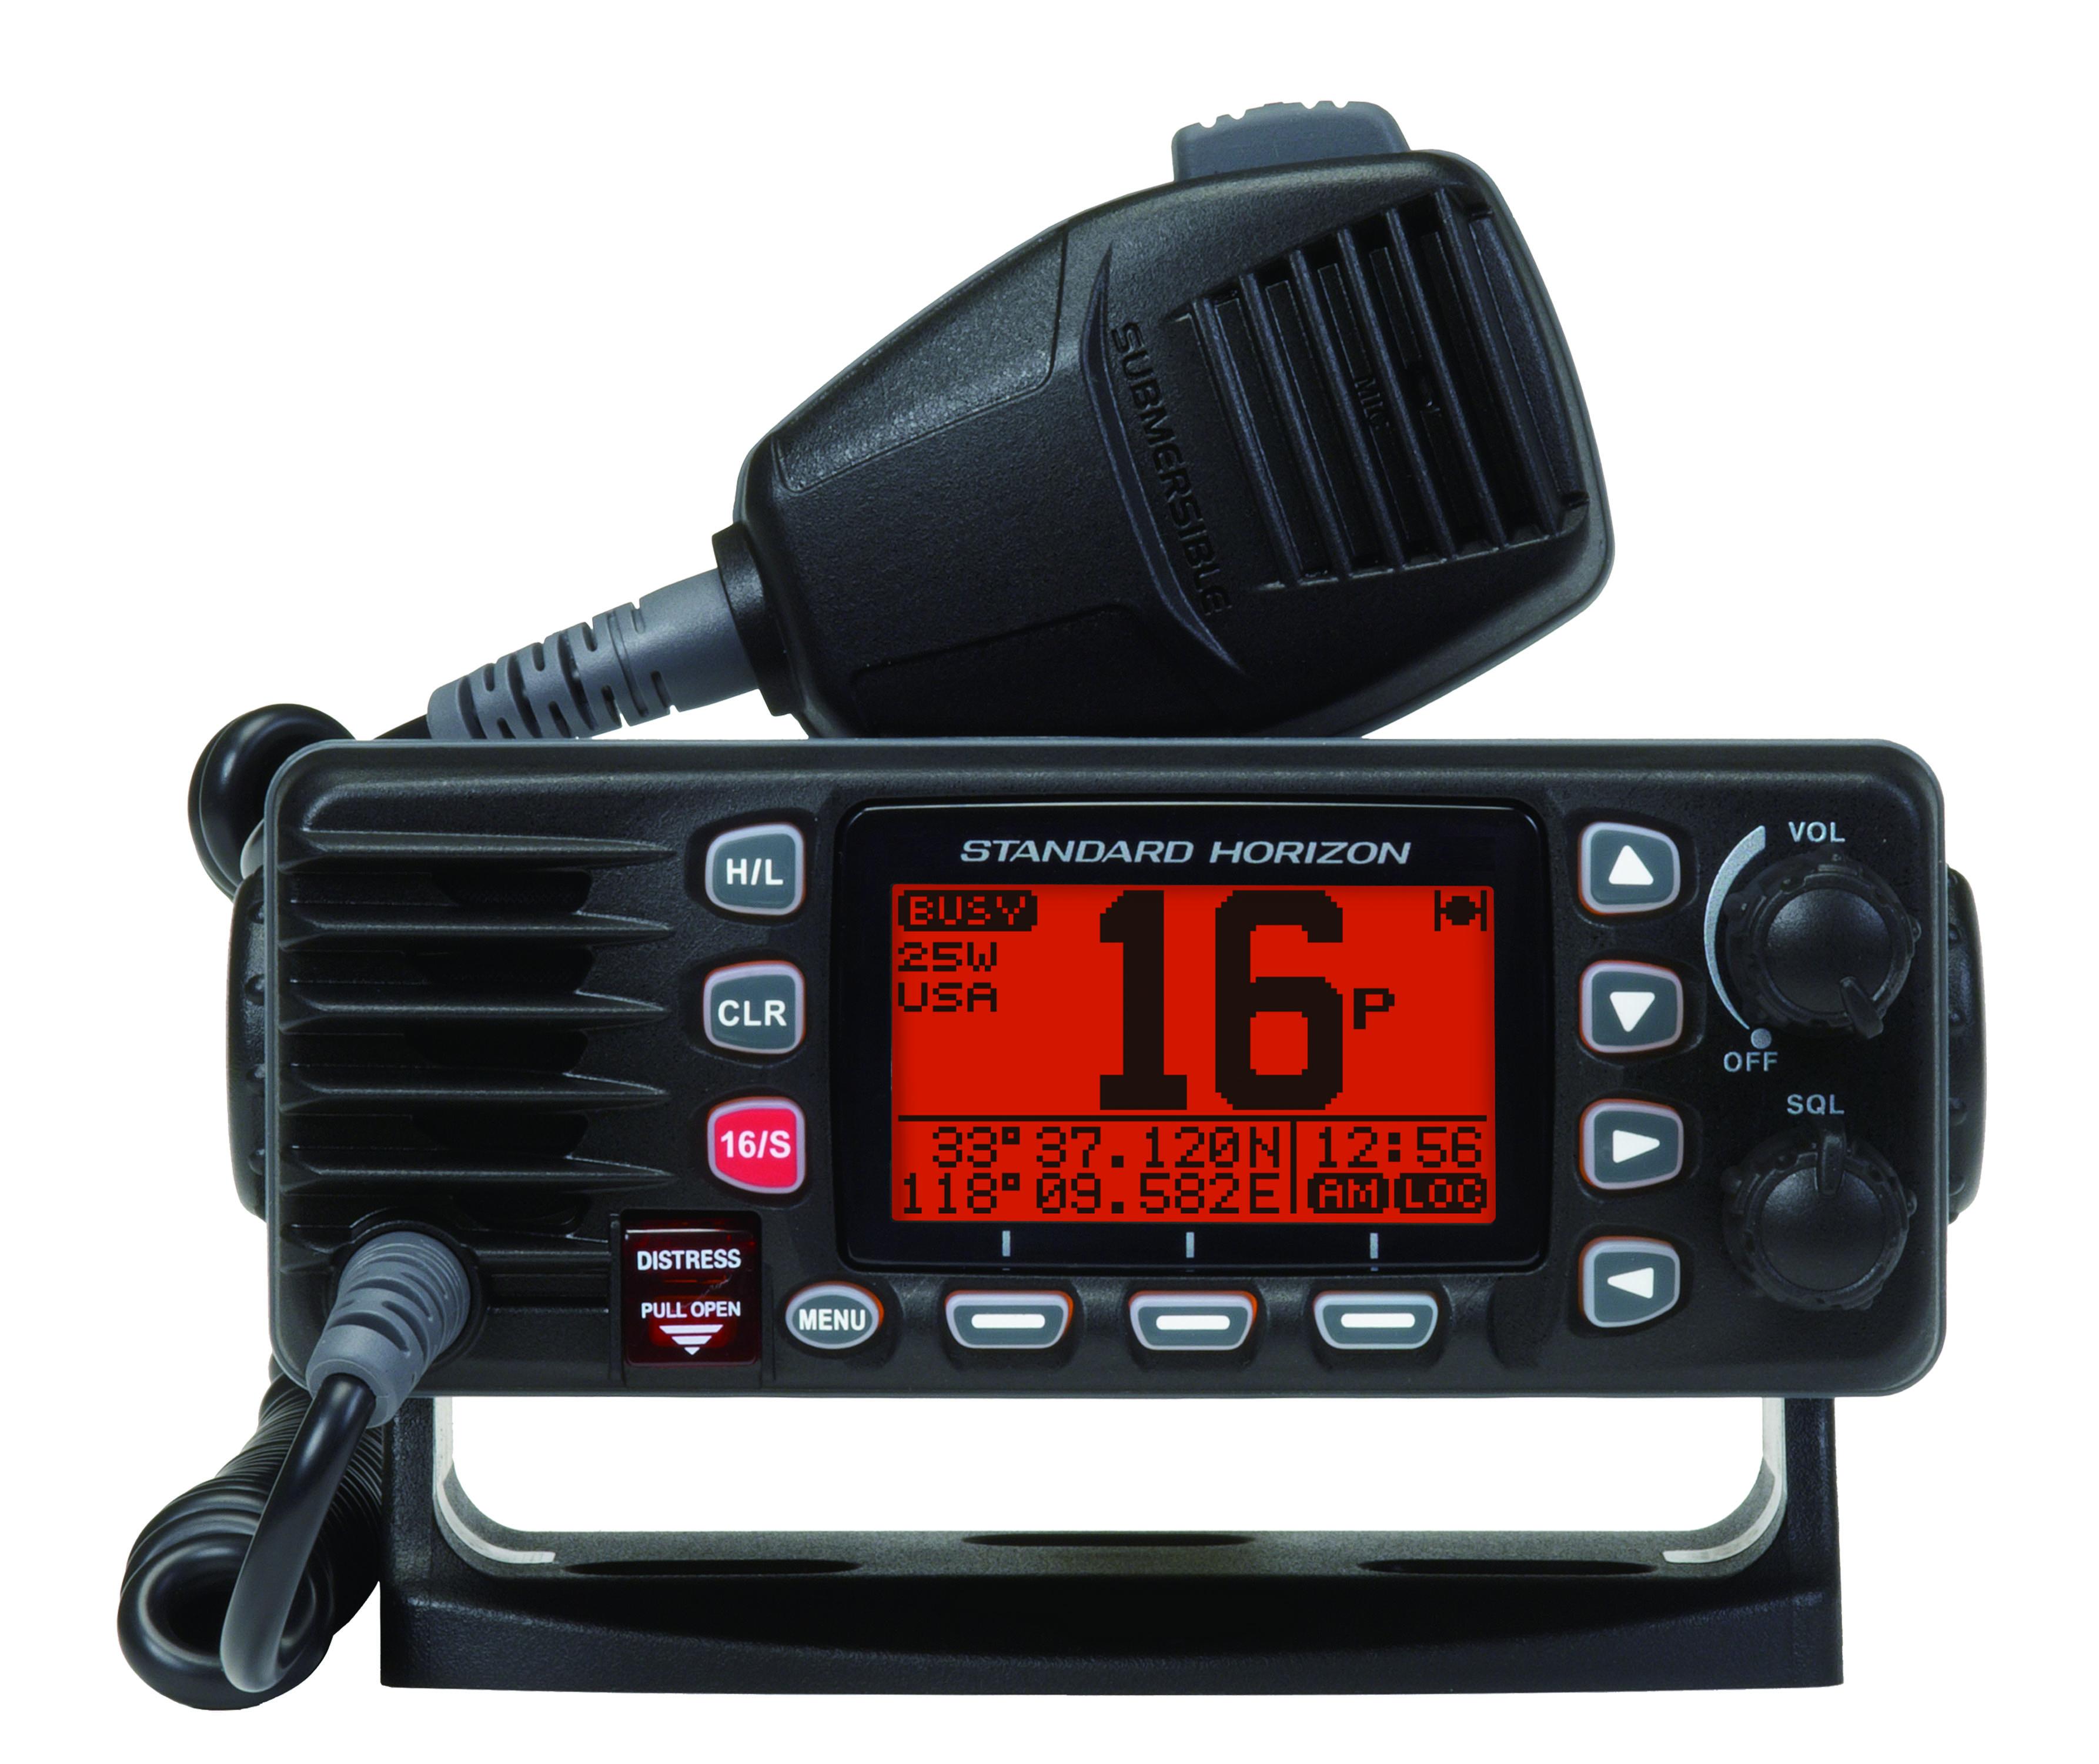 Vhf Raadiojaam Standard Horizon1300 Eclipse Dsc Ais Gps Wiring Diagram Gx1300 Black Front Cmyk 350dpi